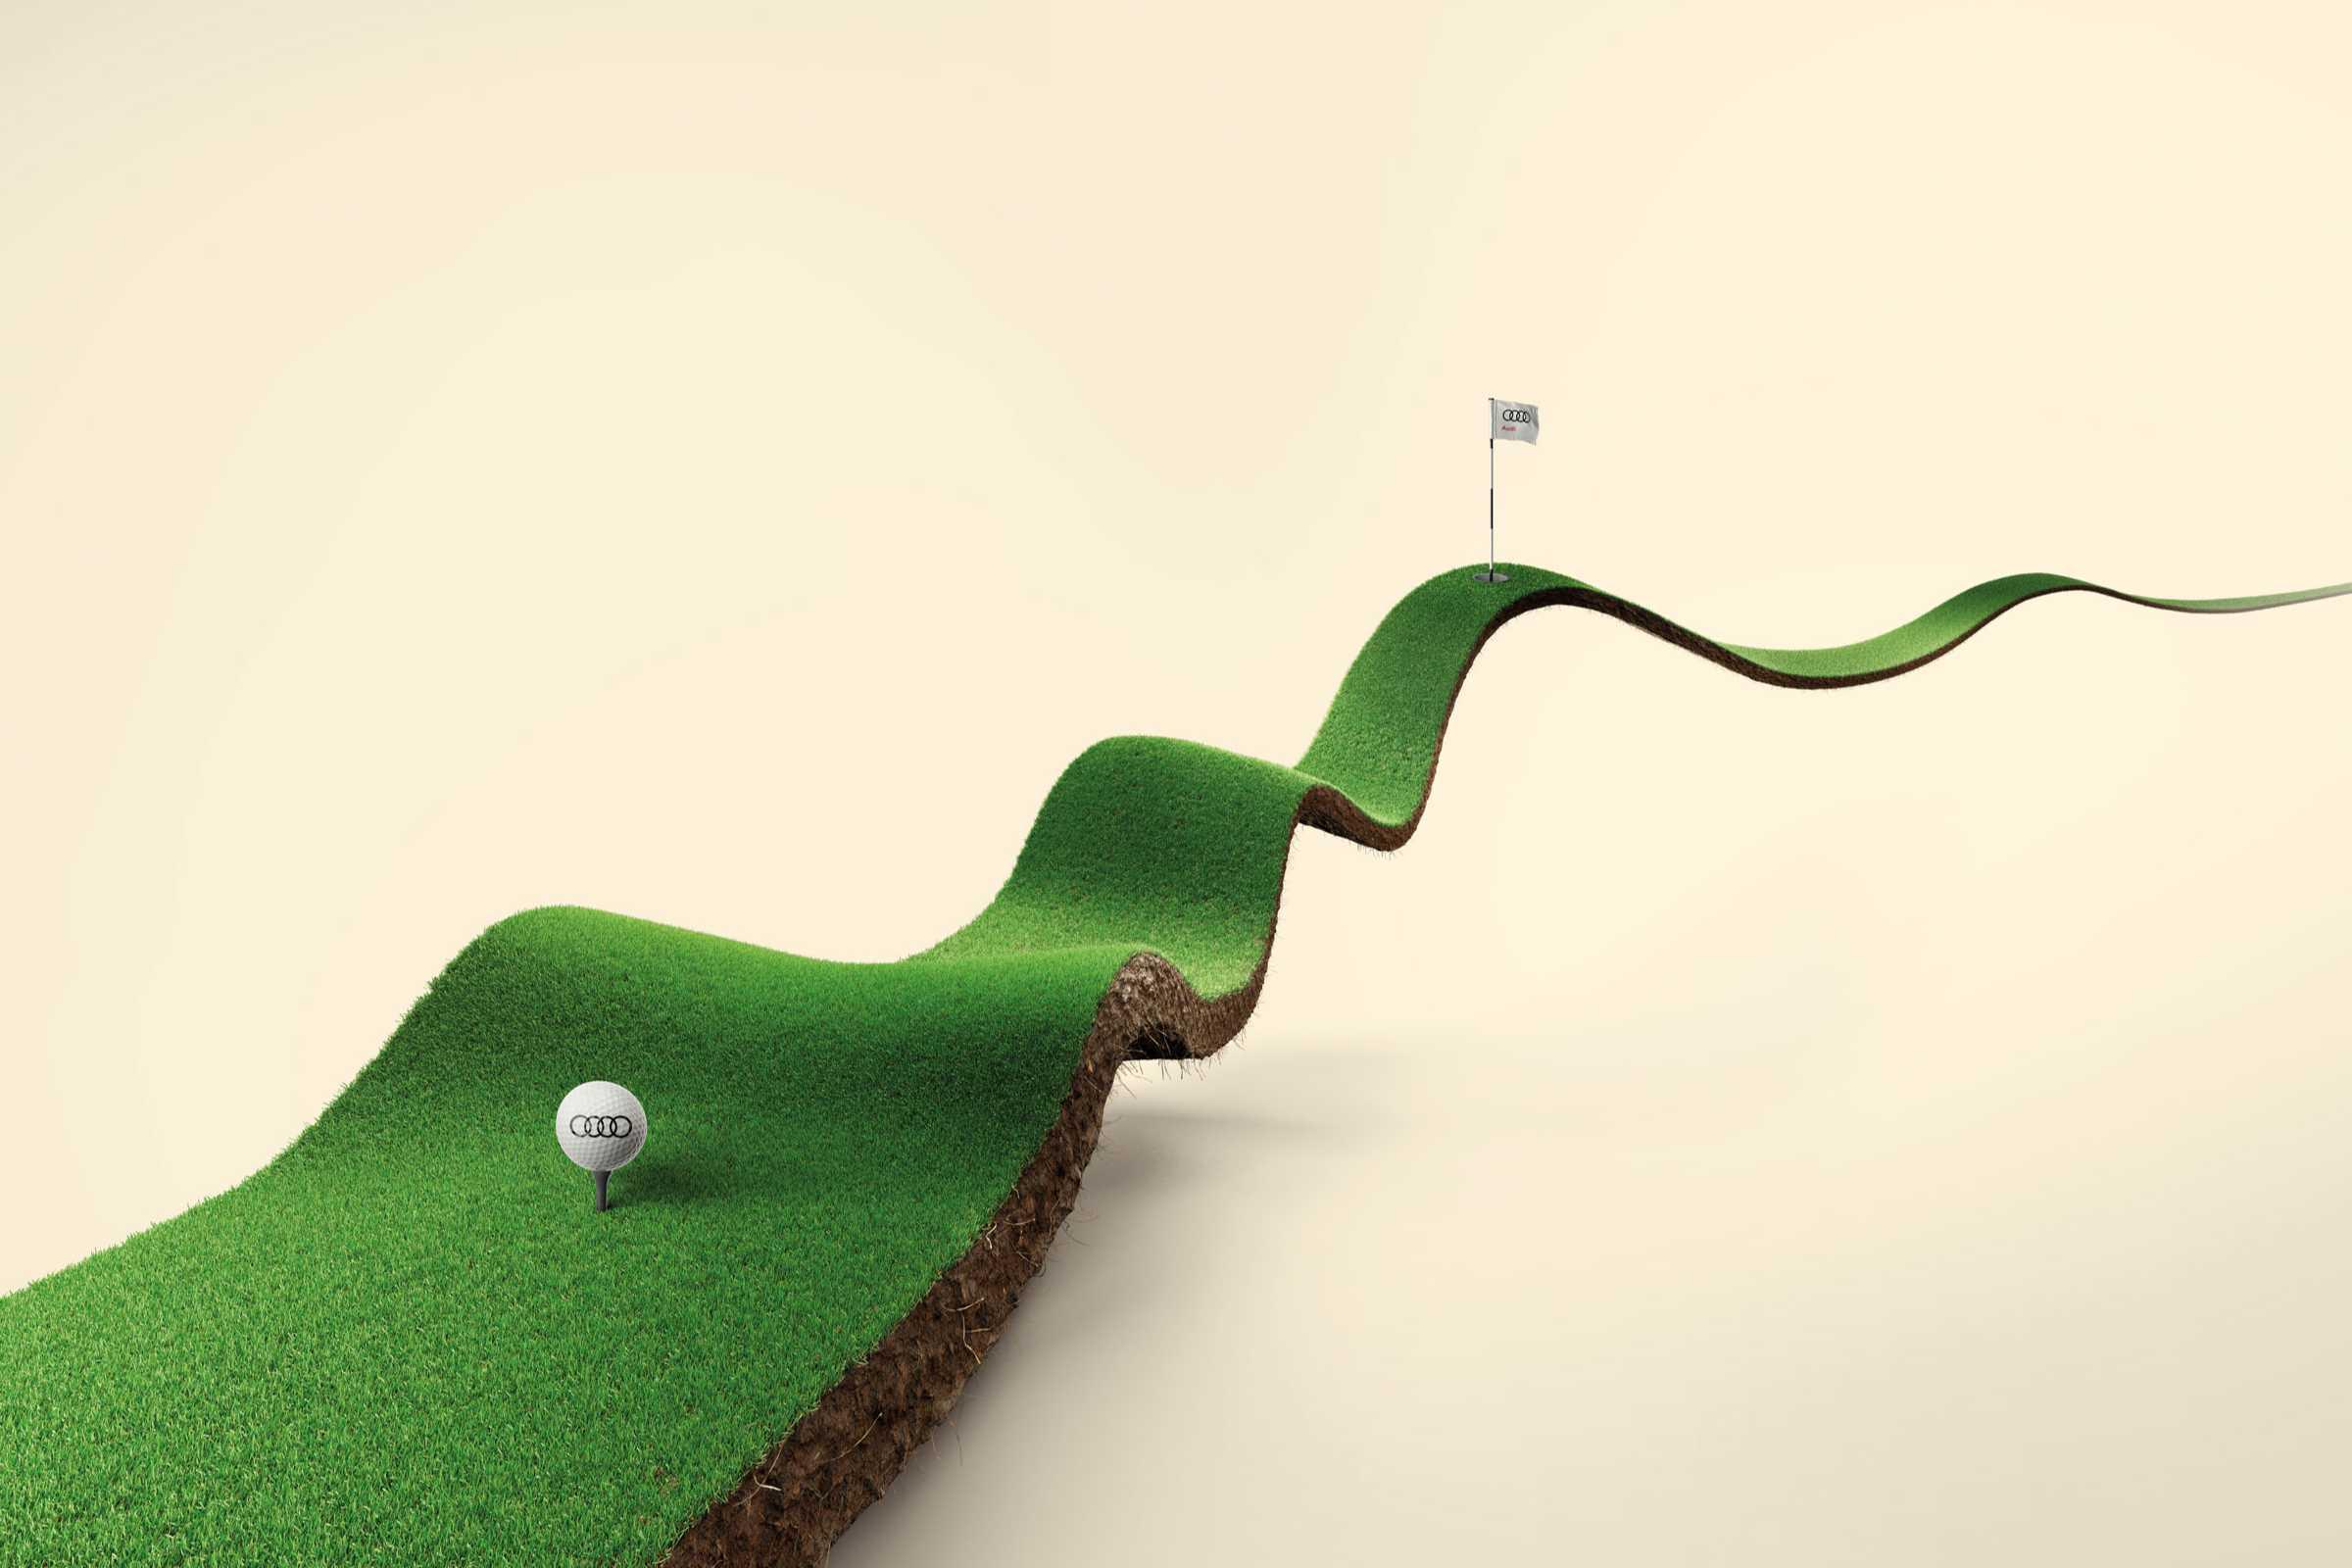 AUDI golf 2019